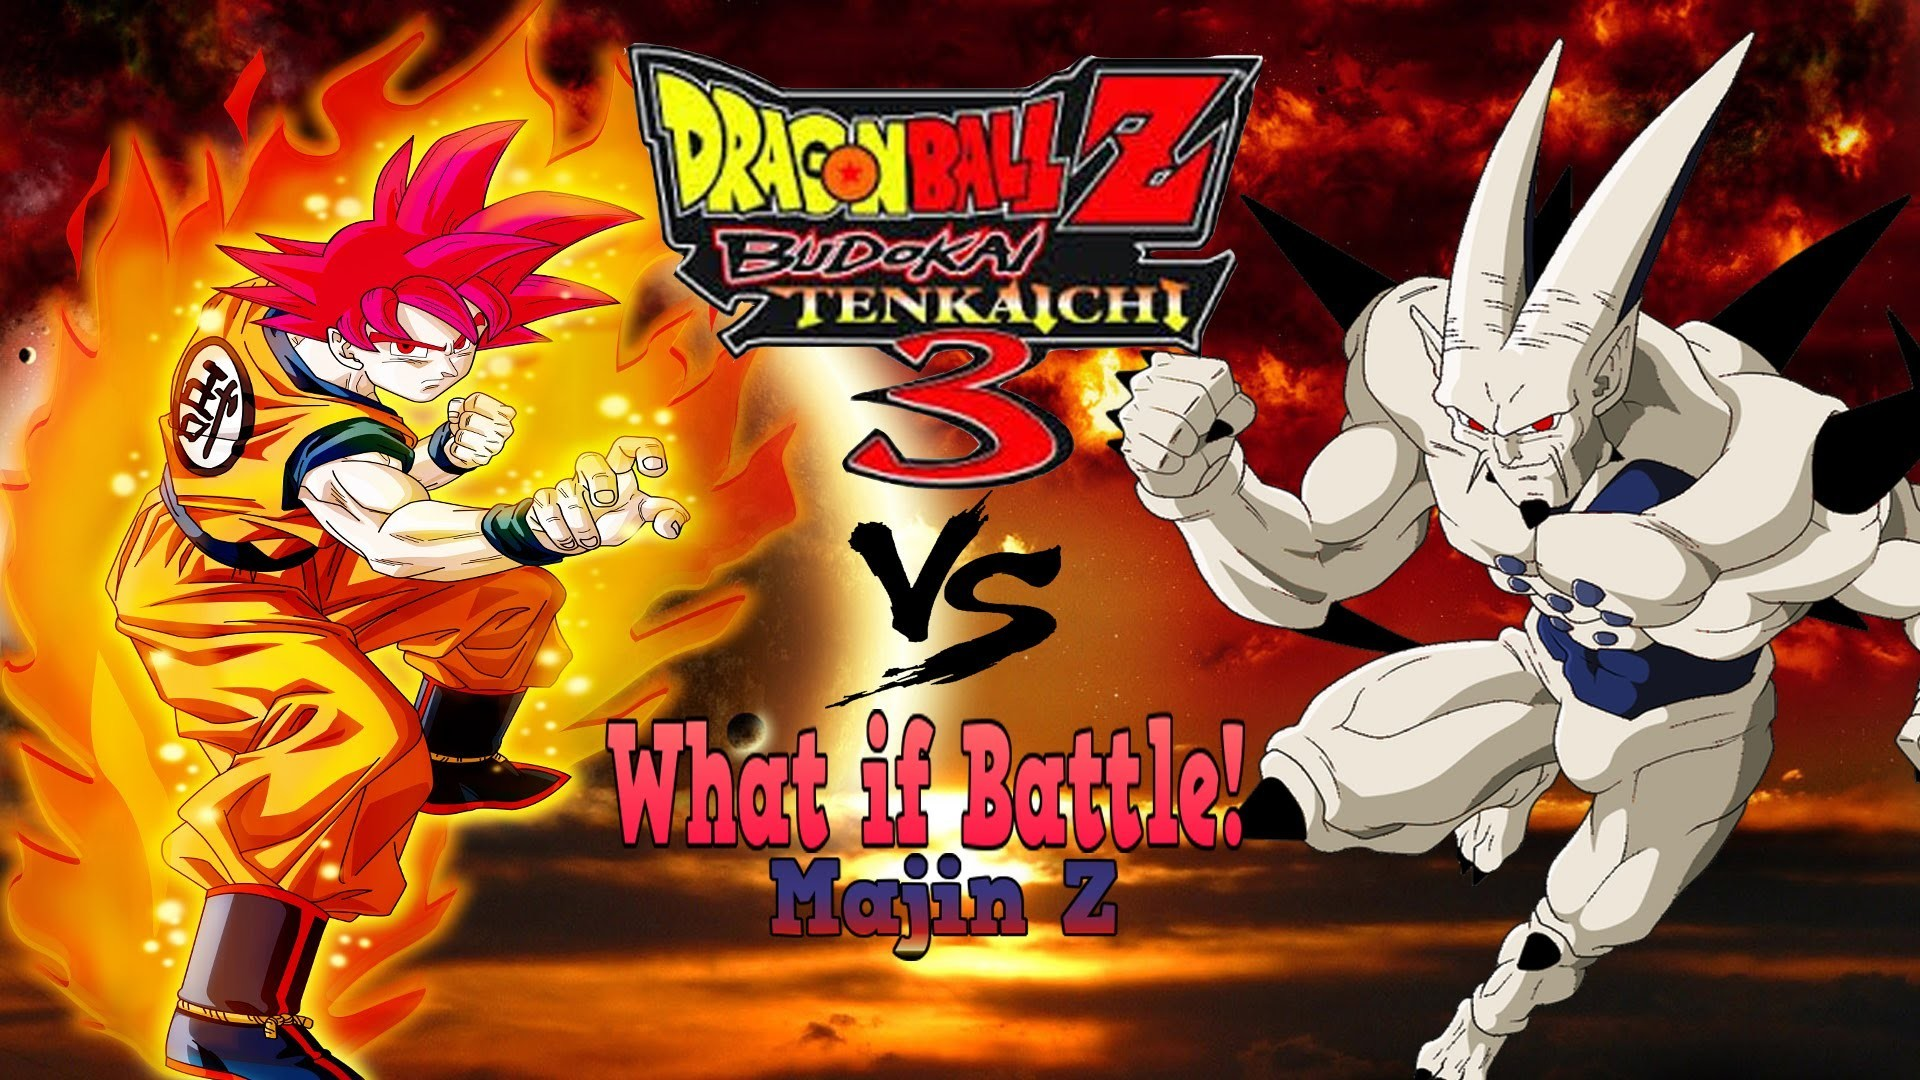 Goku Super Saiyan God vs Omega shenron ( Dragonball Z Budokai Tenkaichi 3  Mod) – YouTube